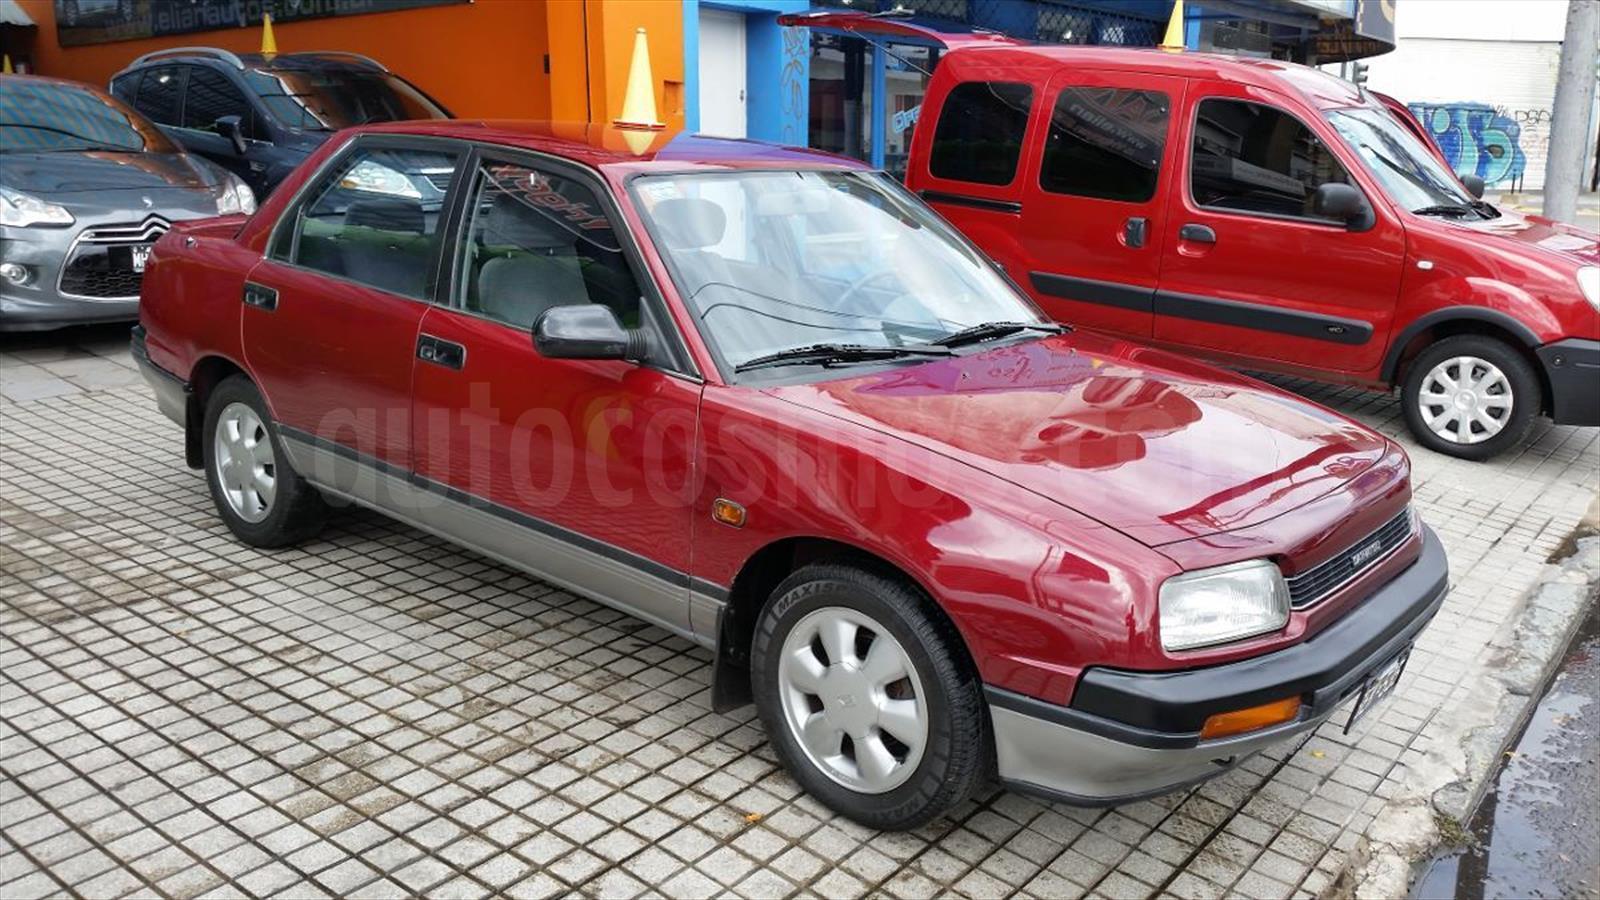 Venta Autos Usado Buenos Aires Gba Daihatsu Applause 1